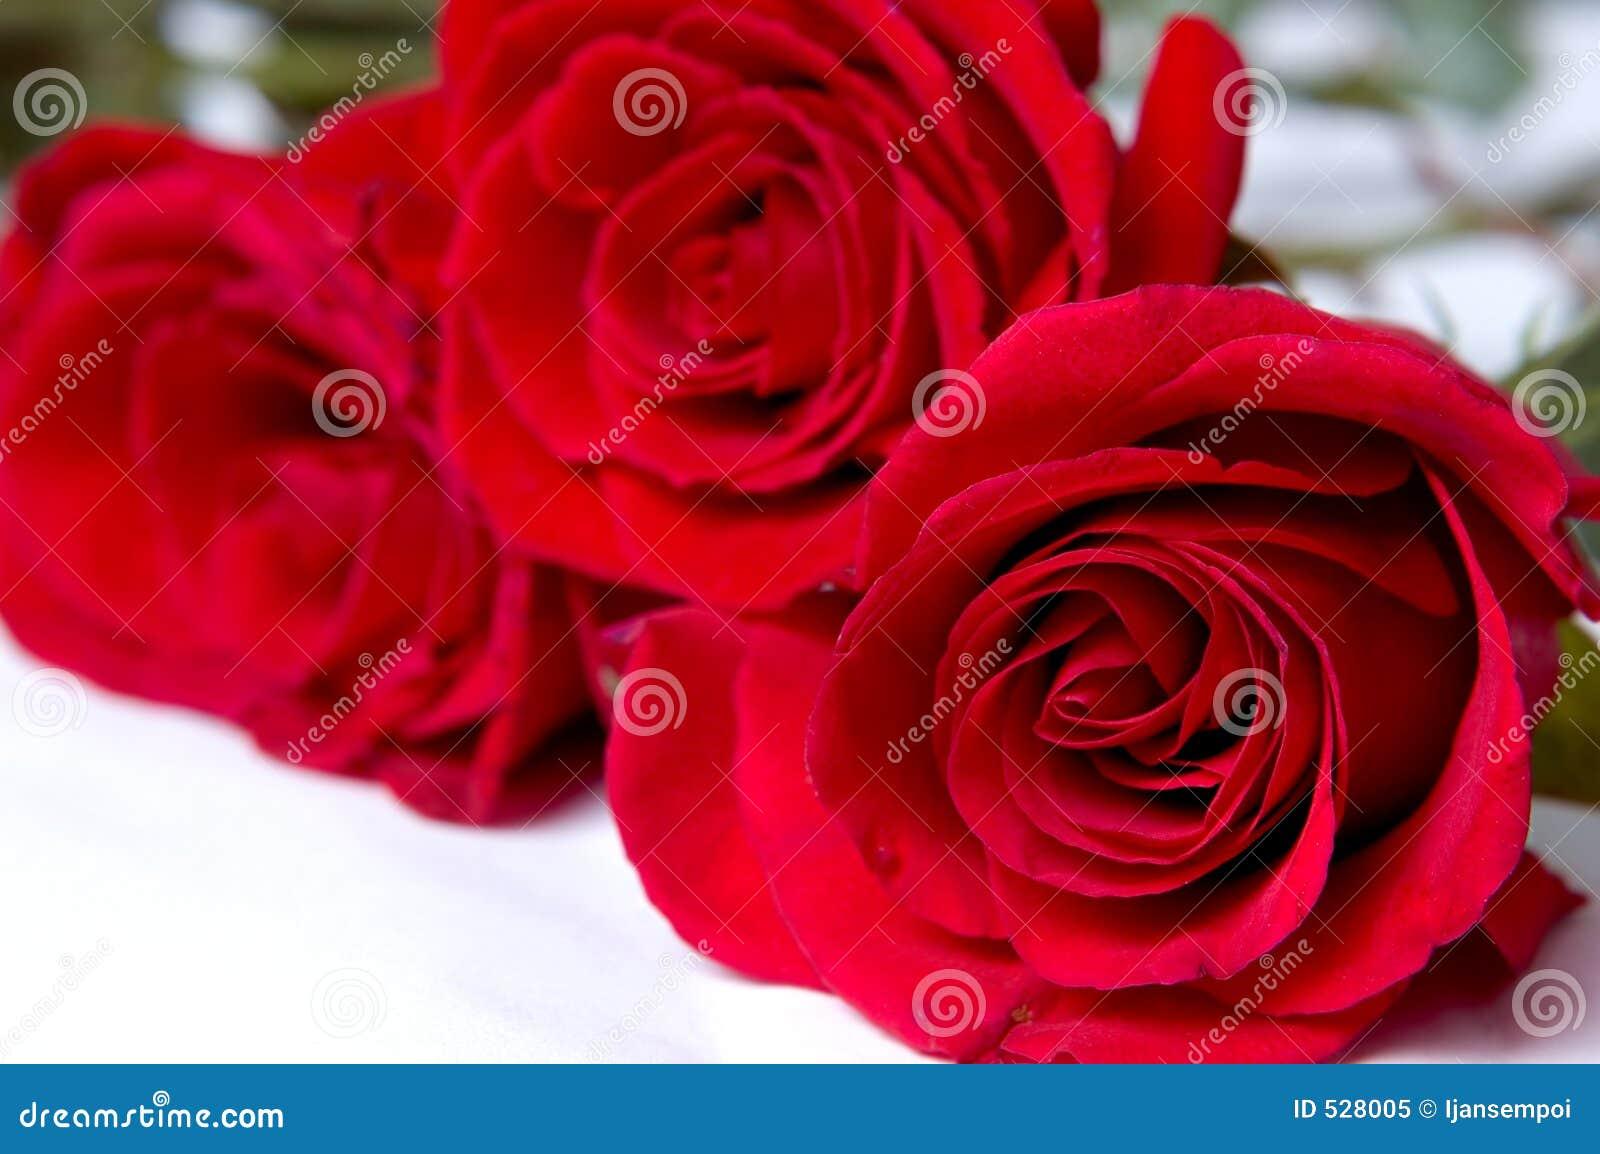 Download 红色玫瑰 库存图片. 图片 包括有 特殊, 关系, 降低, 锋利, 感觉, 言情, 卖花人, 关闭, 绿色, 婚姻 - 528005